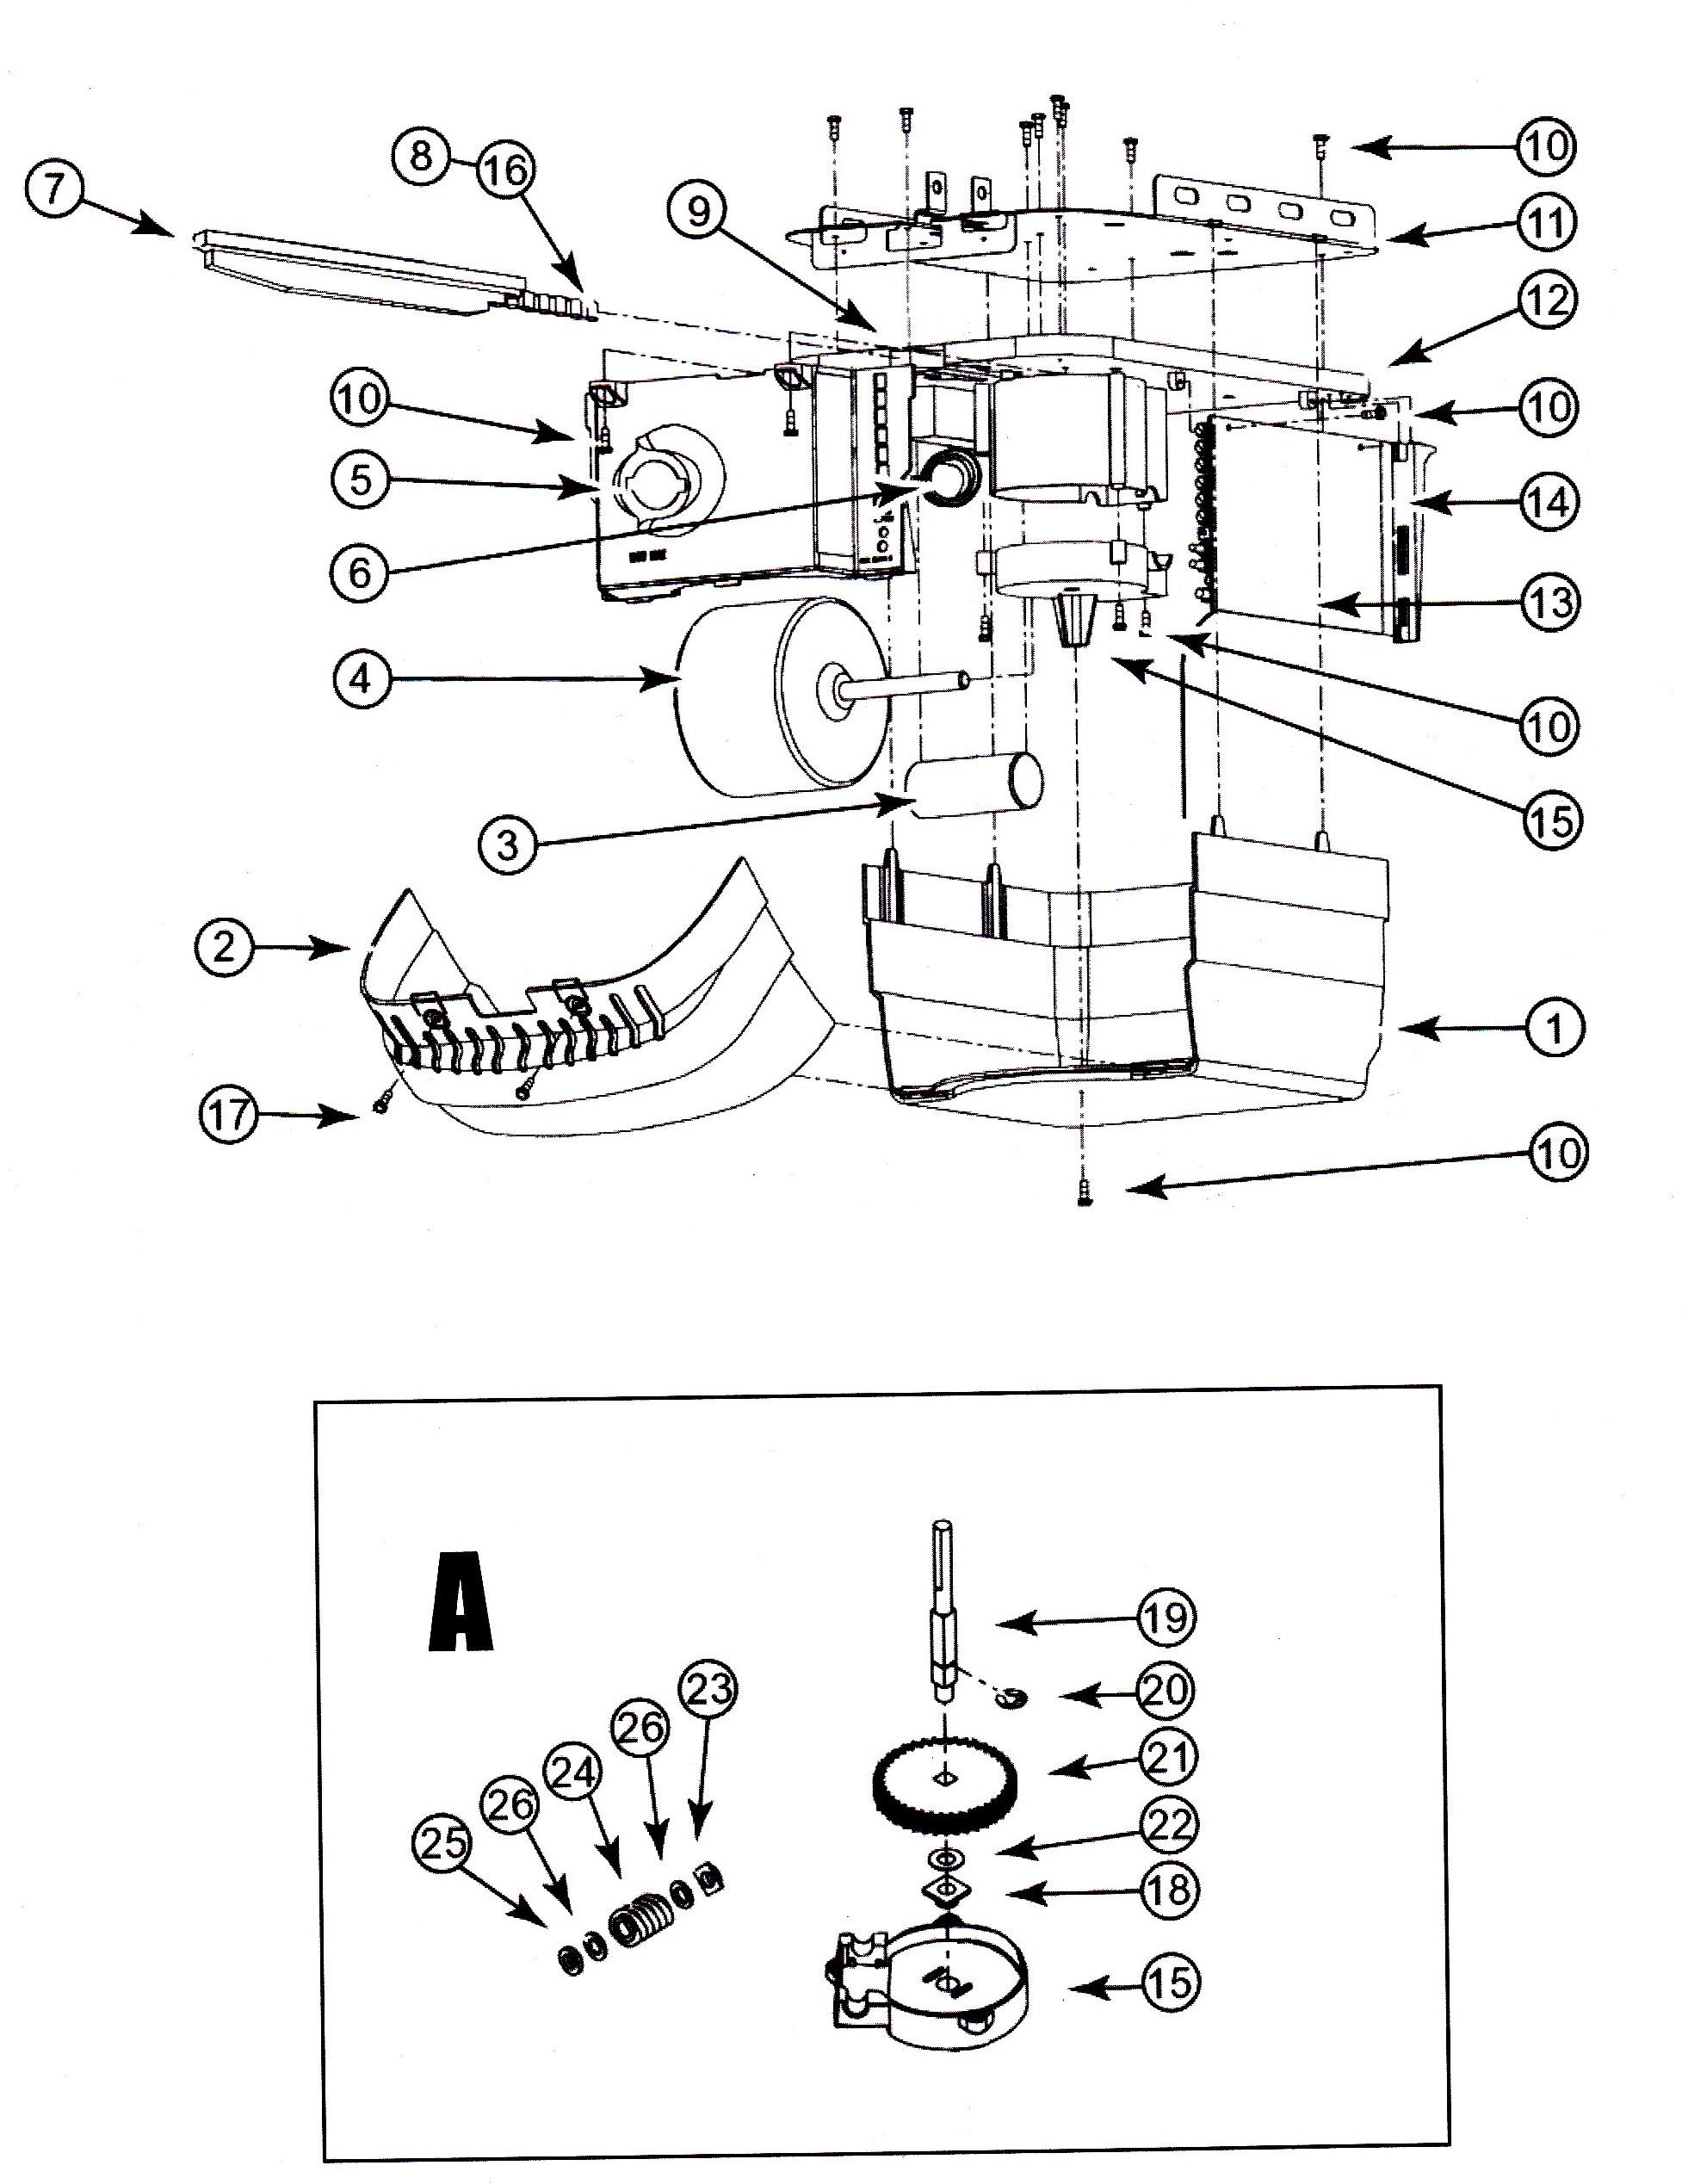 hight resolution of genie lift 1930 wiring diagram